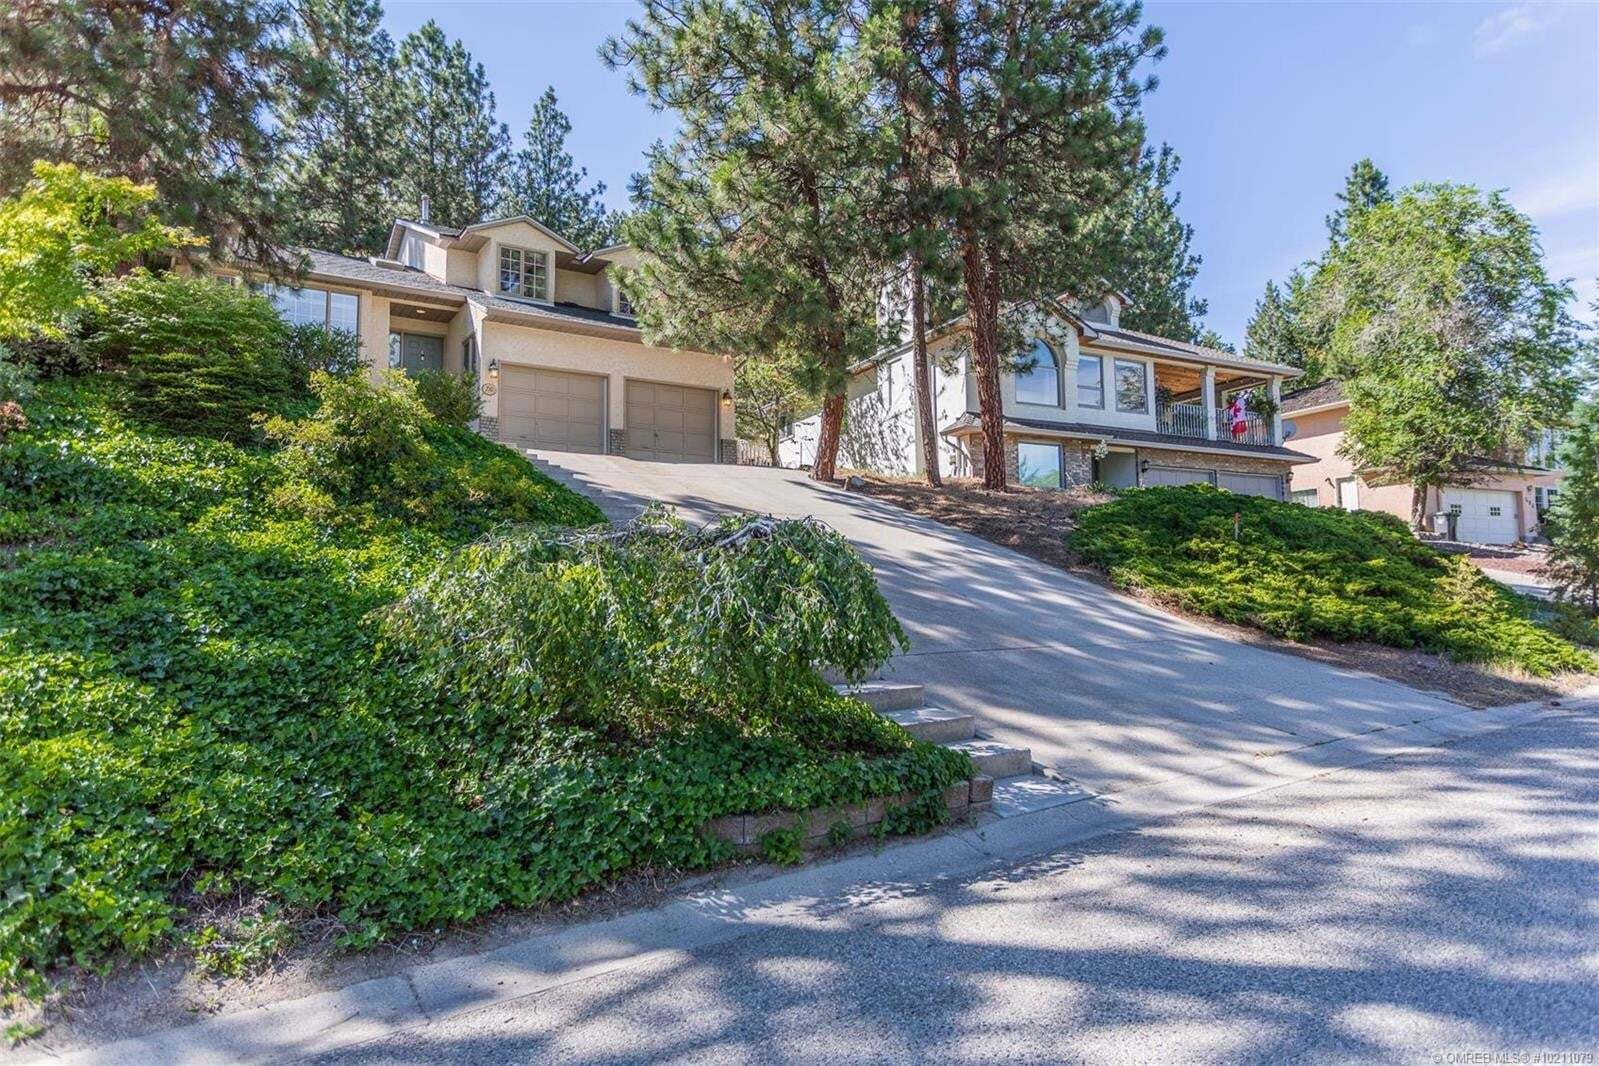 House for sale at 710 Cassiar Rd Kelowna British Columbia - MLS: 10211079